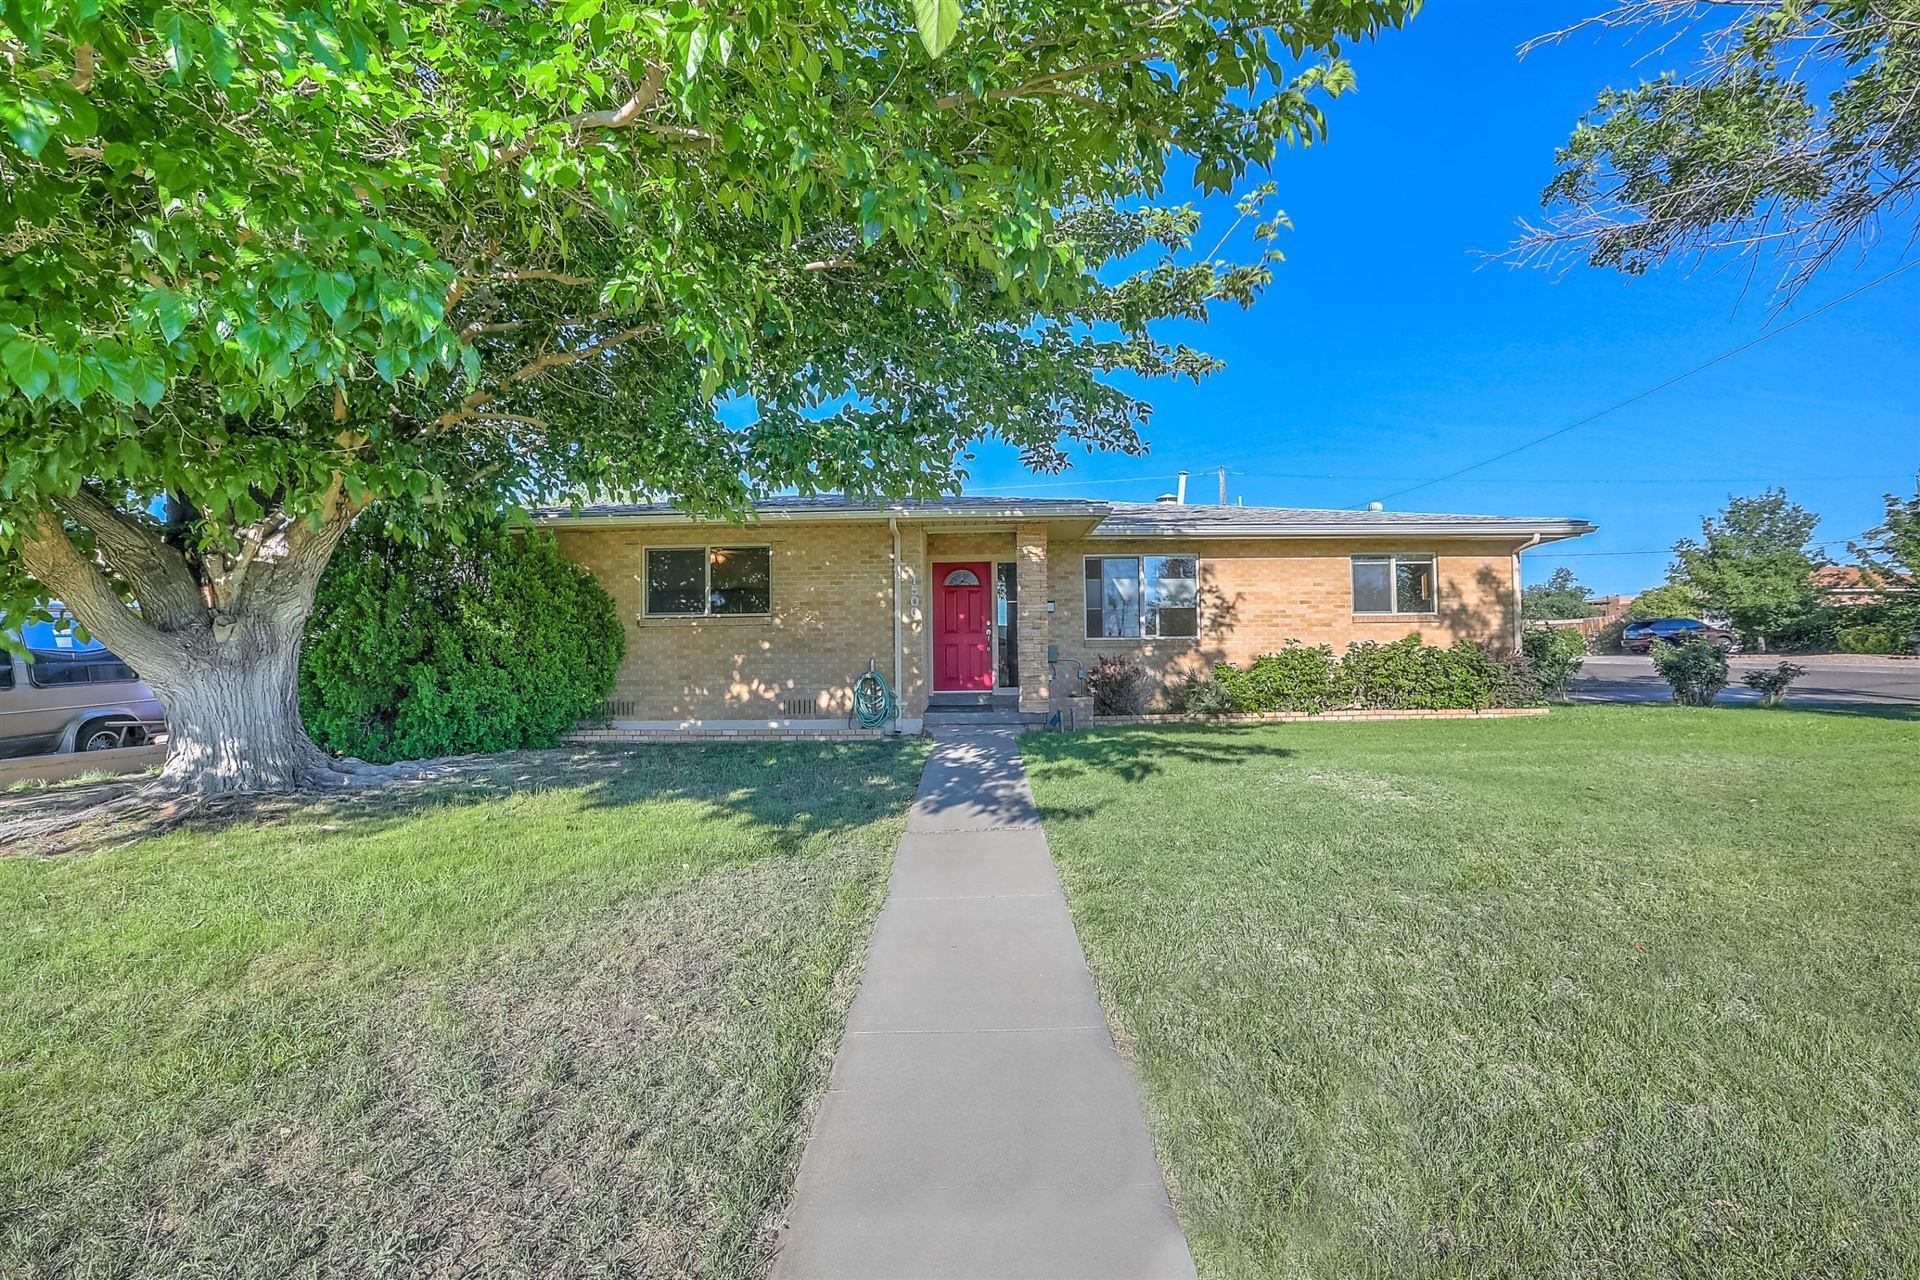 Photo of 1500 DARTMOUTH Drive NE, Albuquerque, NM 87106 (MLS # 970243)